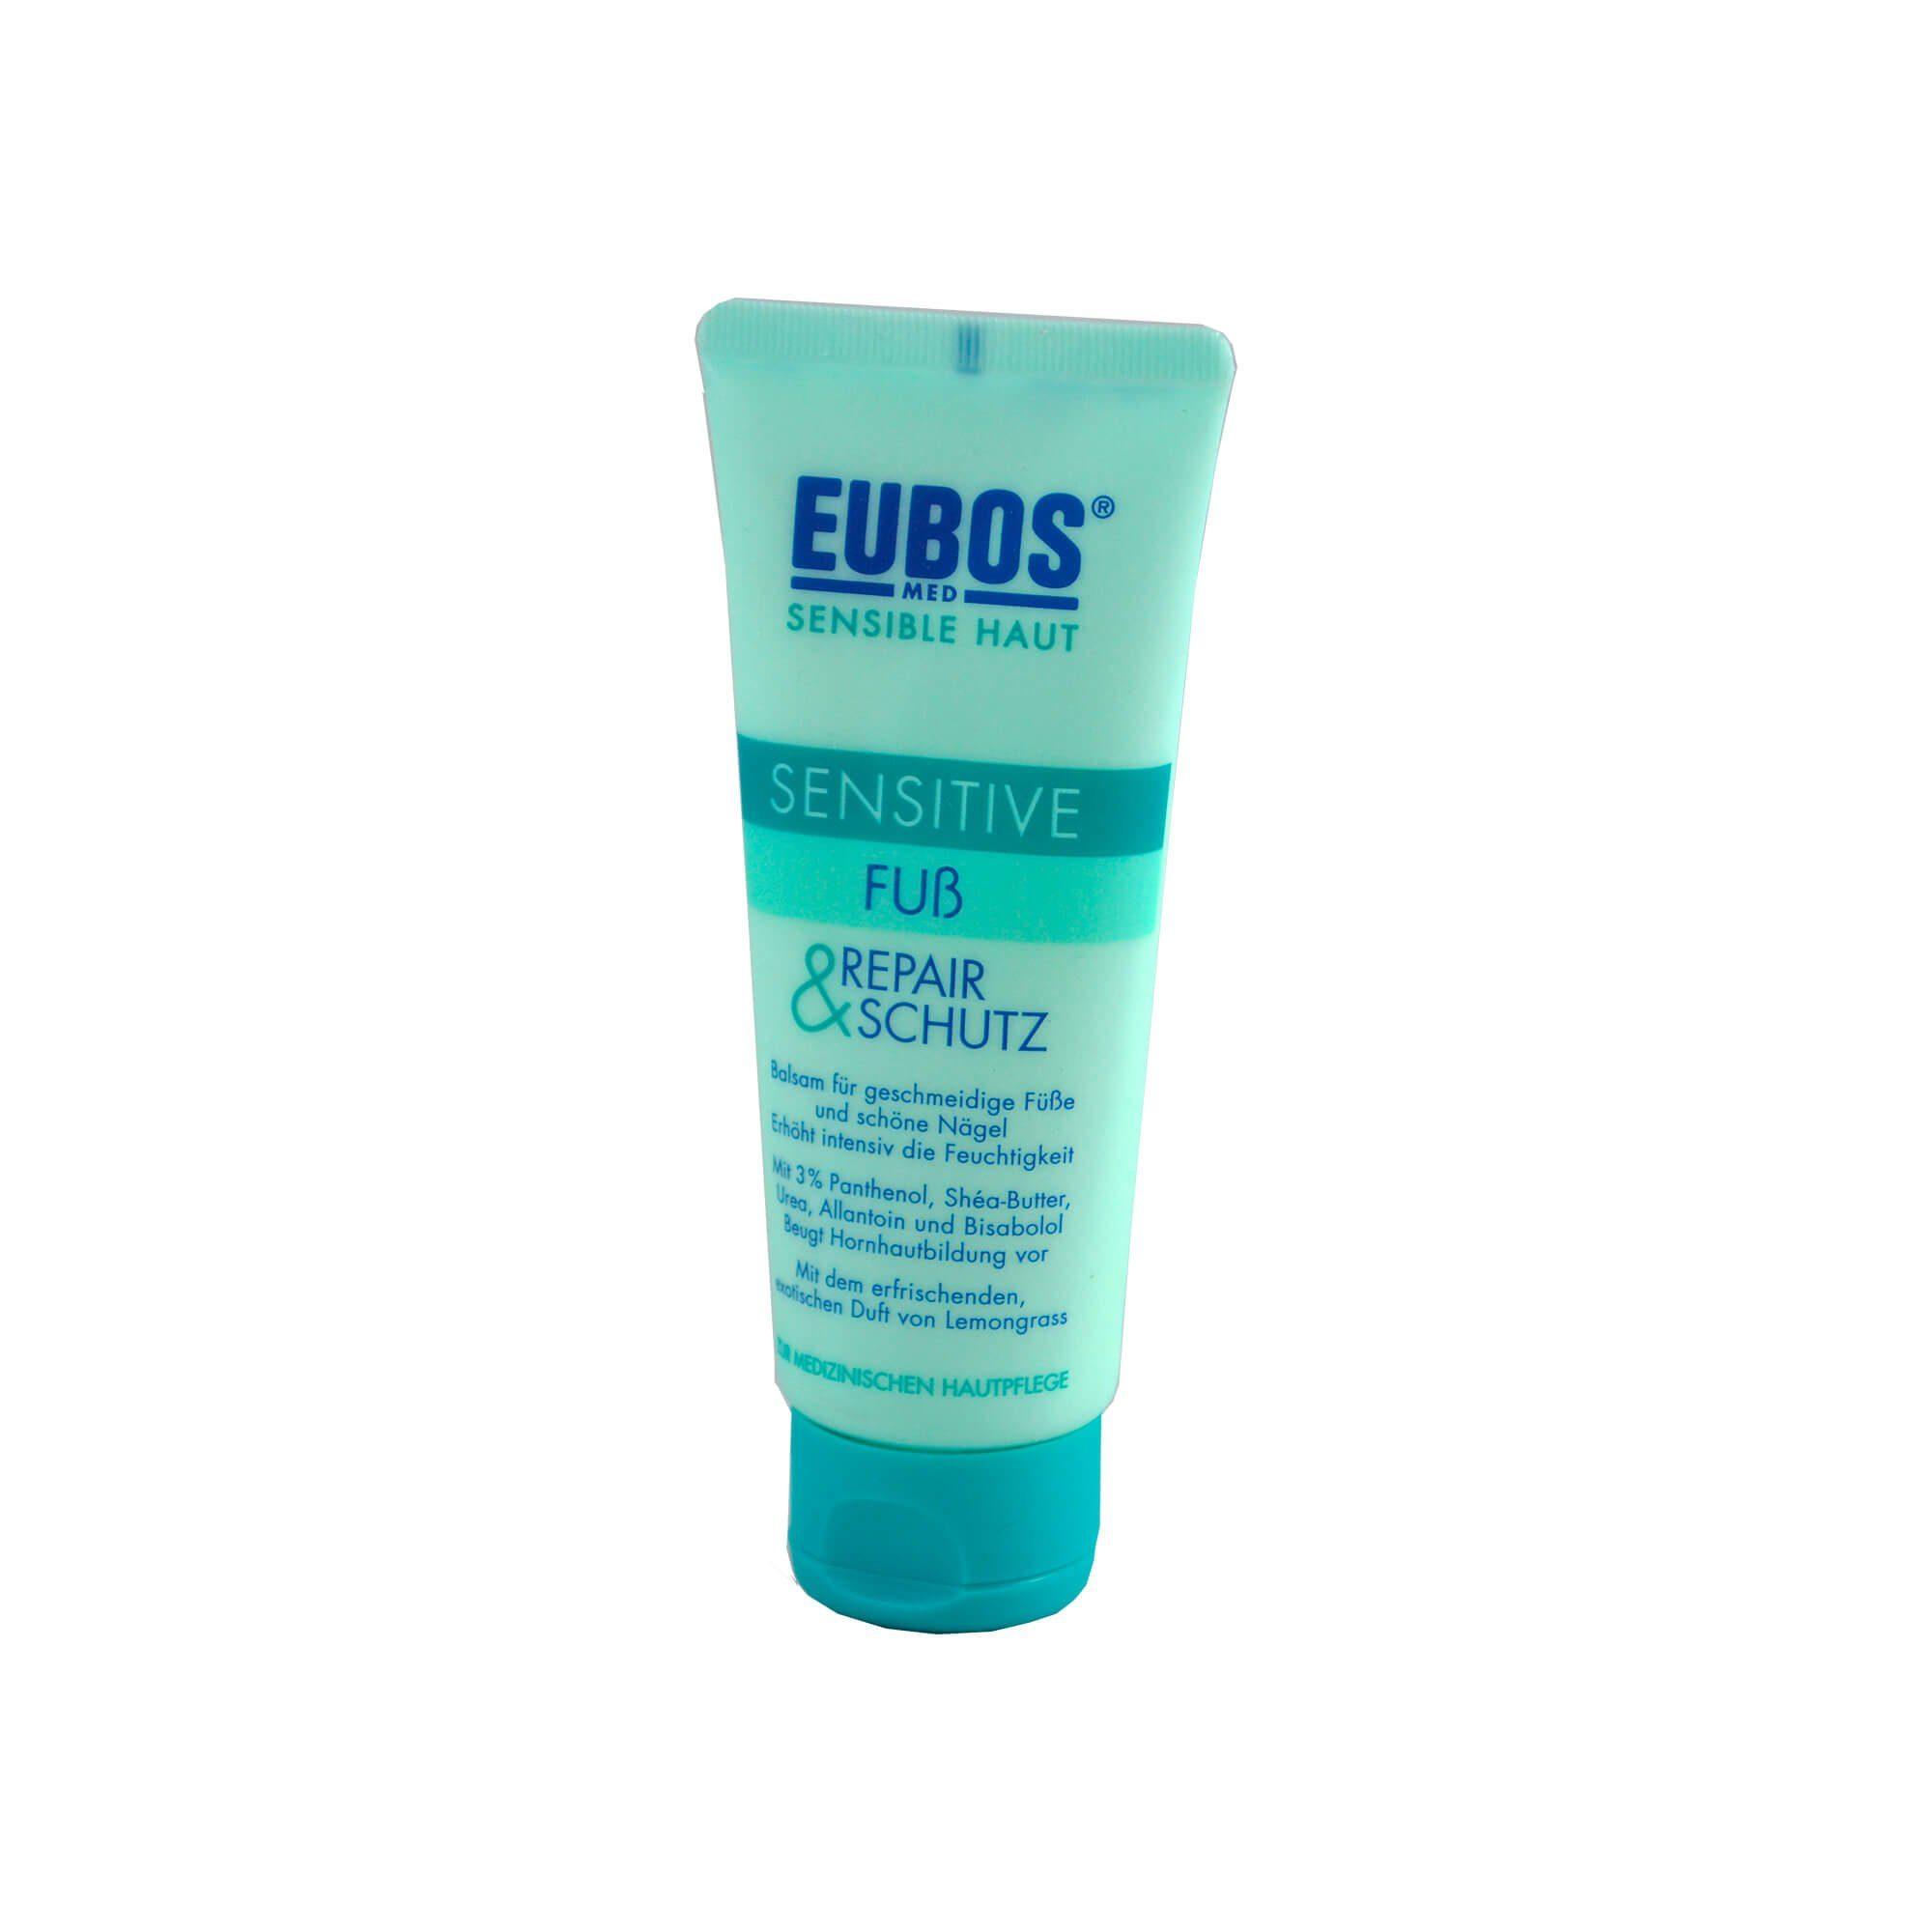 Eubos Eubos Sensitive Fuss Repair + Schutzcreme , 100 ml